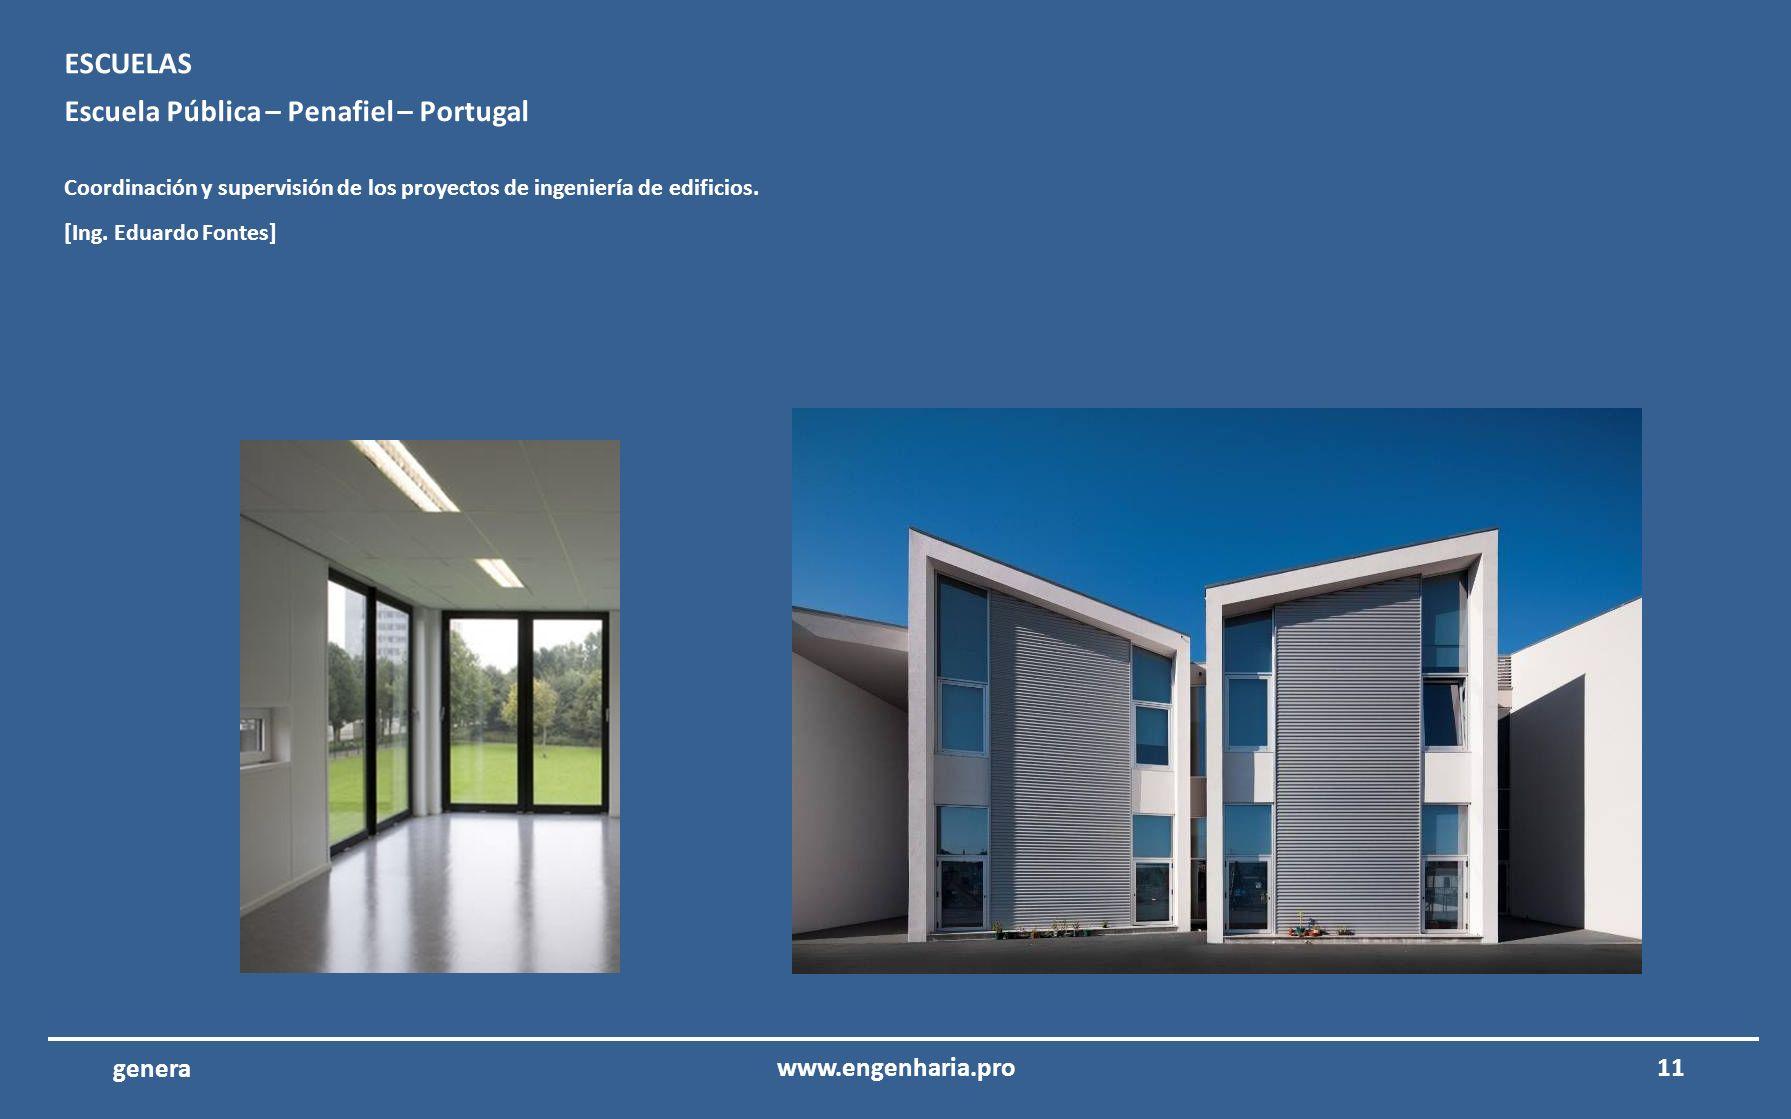 Escuela Pública – Penafiel – Portugal